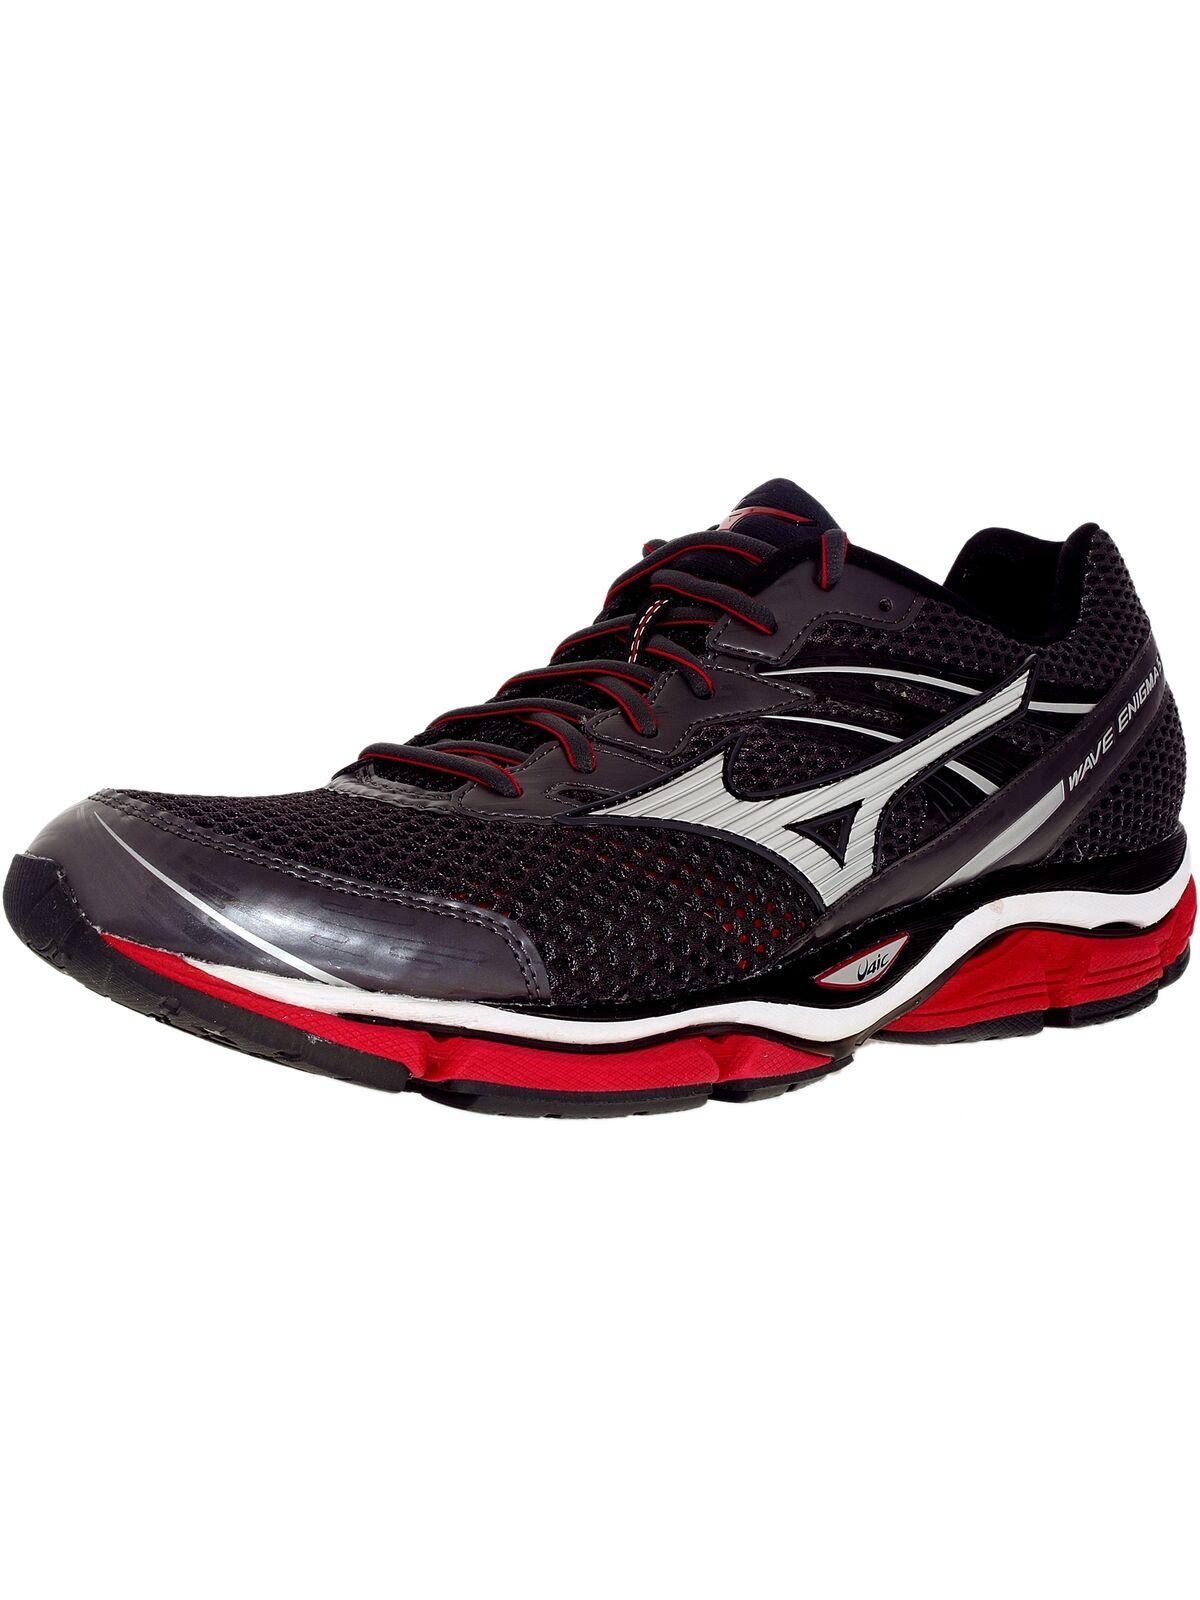 Men's Wave Enigma 5 Ankle-High Tennis shoes shoes shoes 562413